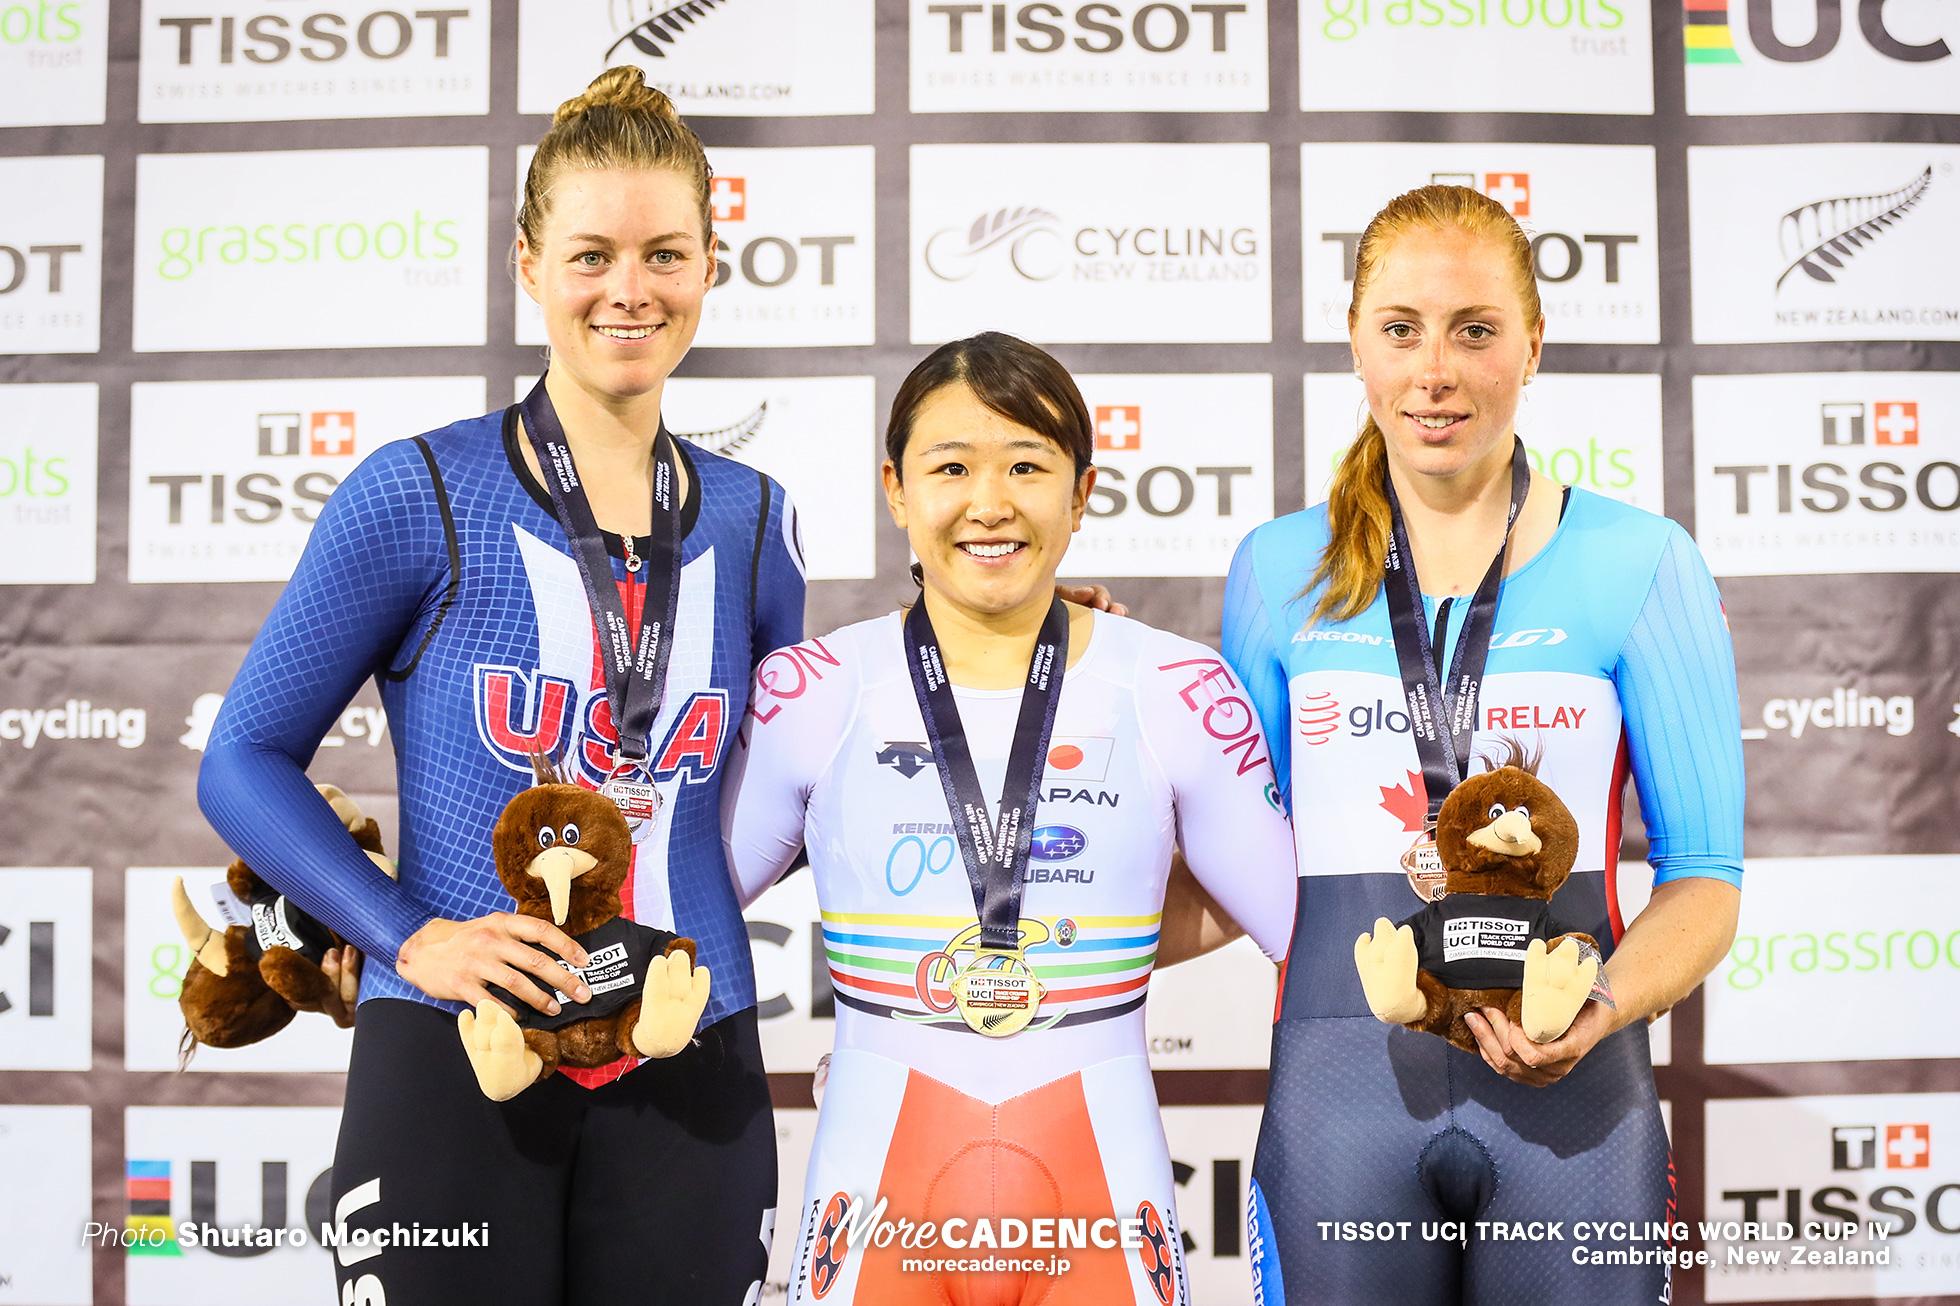 Point Race / Women's Omnium / TISSOT UCI TRACK CYCLING WORLD CUP IV, Cambridge, New Zealand, 梶原悠未 Jennife VALENTE ジェニファー・バレンテ Allison BEVERIDGE アリソン・ベバレッジ